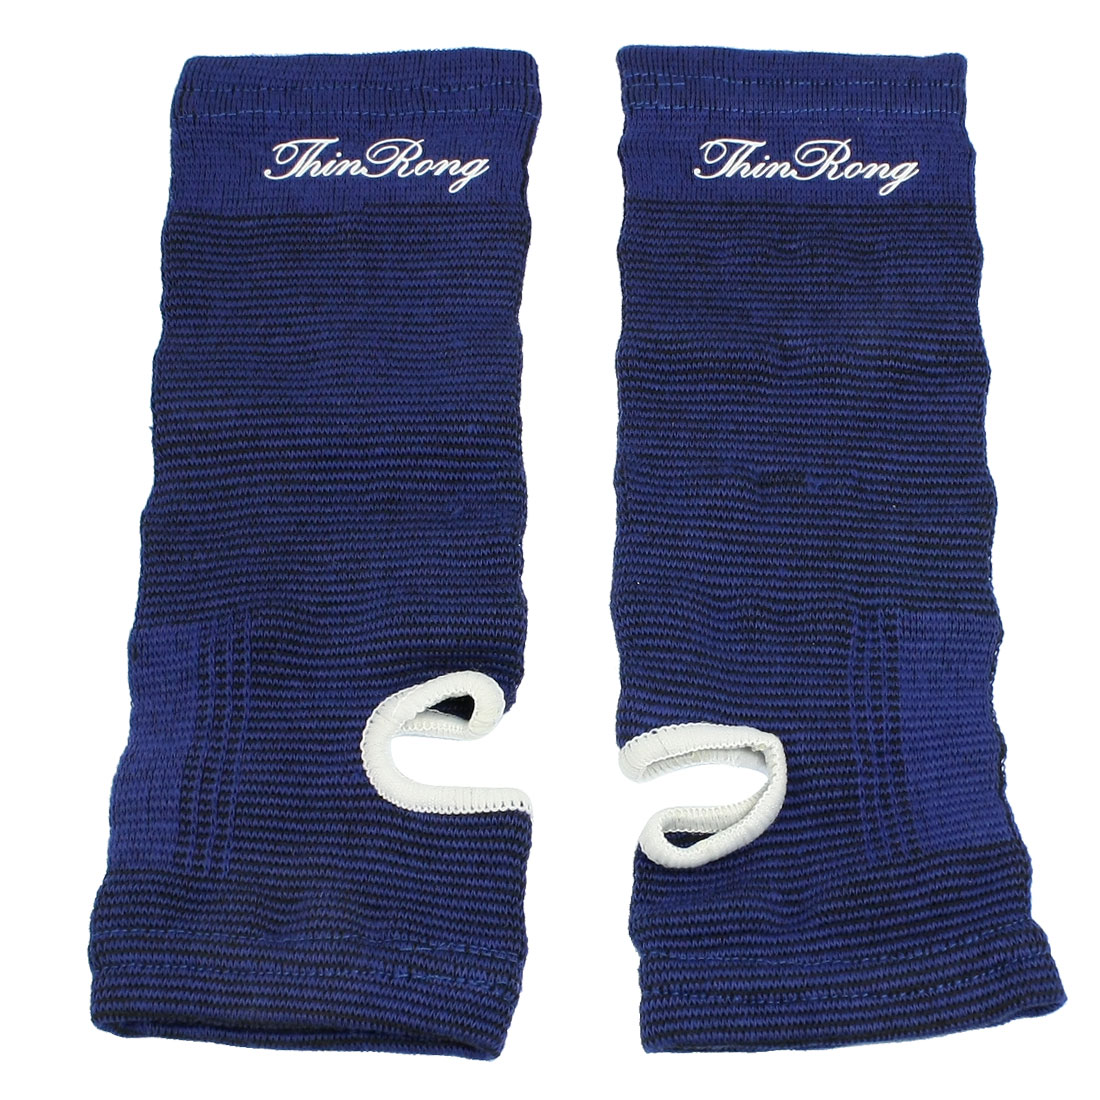 Blue Black Sports Wear Stretchy Sleeve Ankle Support Brace 2 Pcs